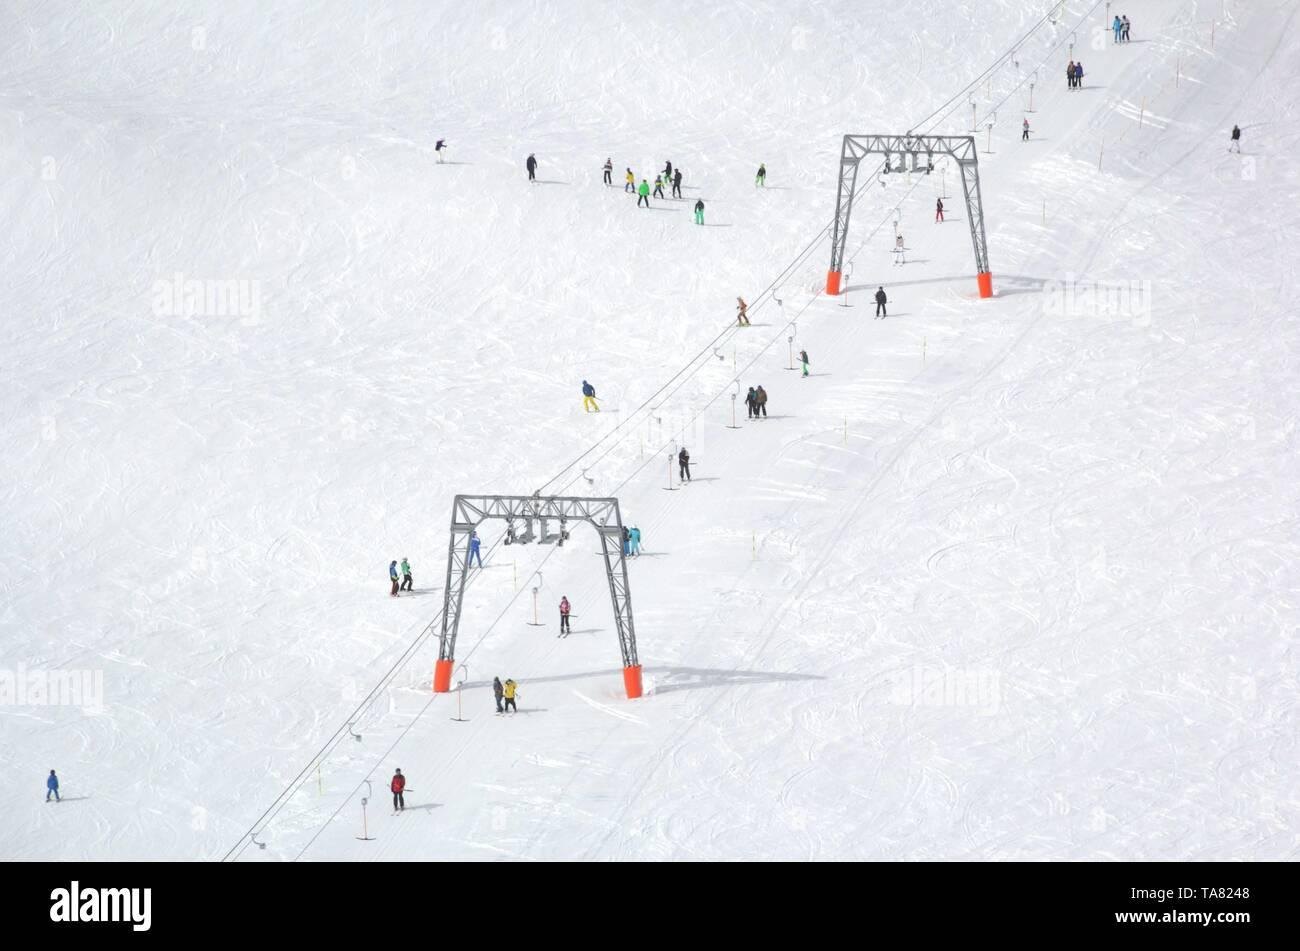 Overview of Austrian ski resort in the Alps of Austria - Stock Image